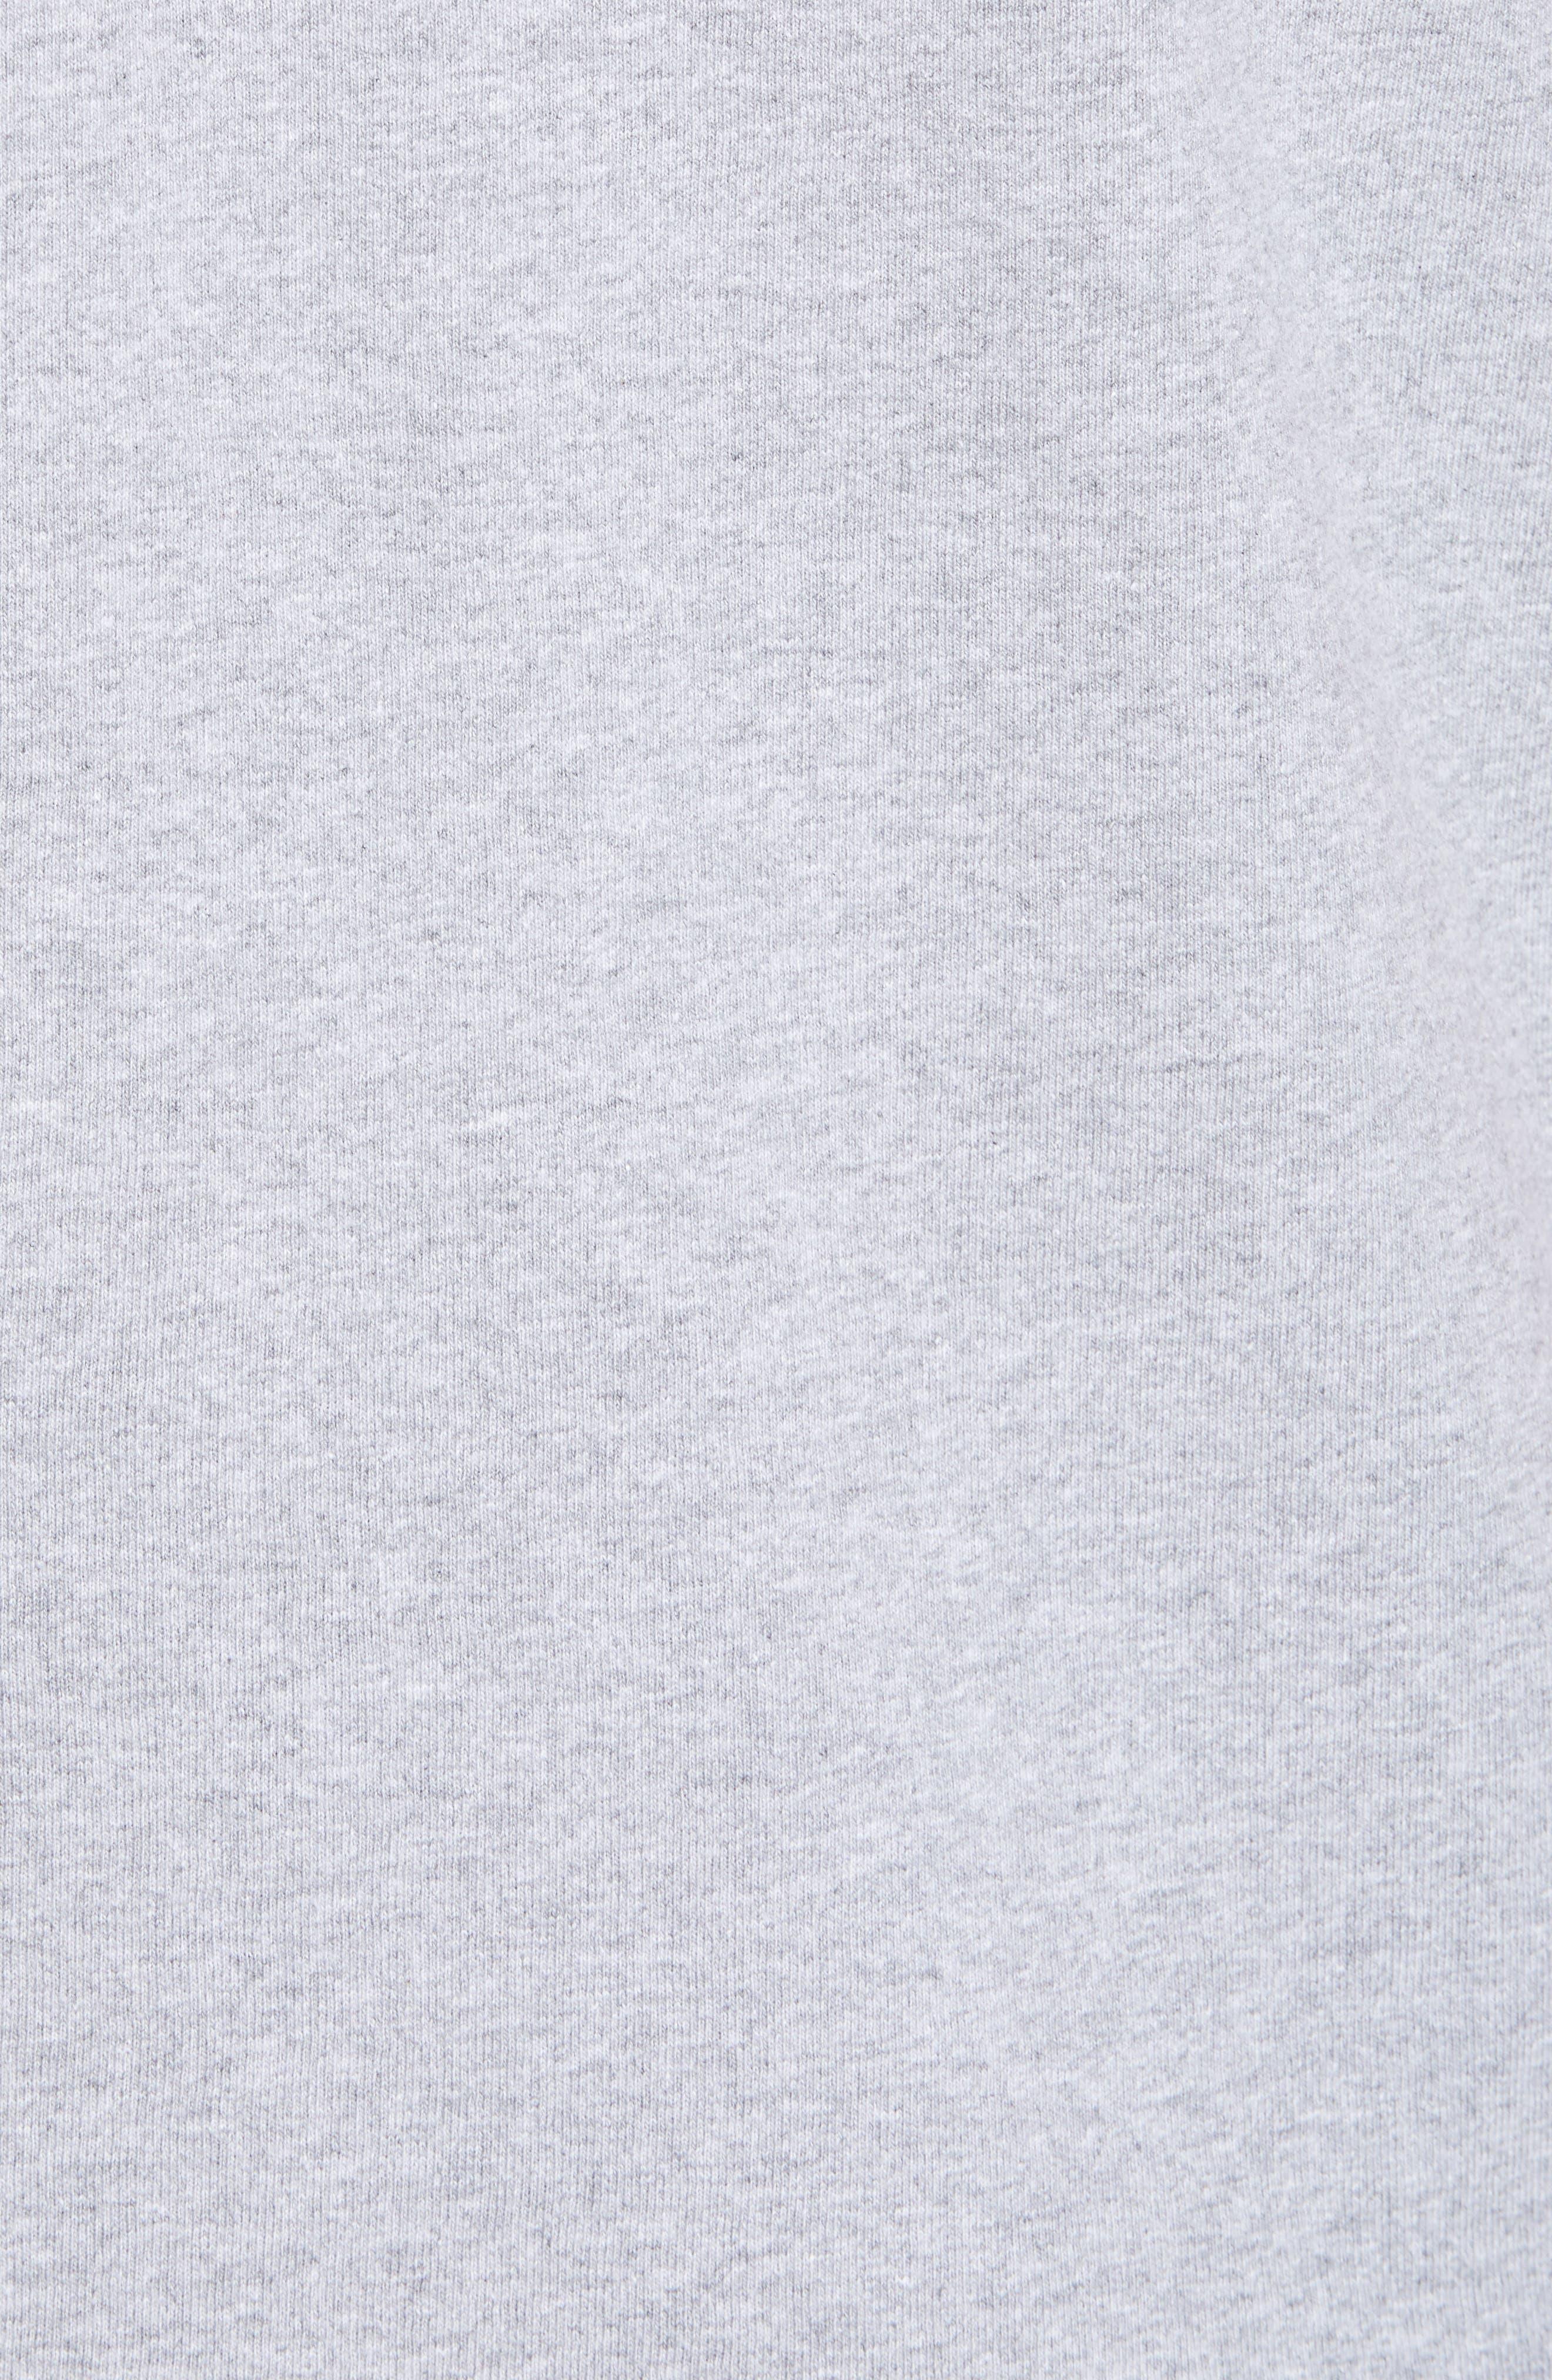 Fitz Roy Trout Crewneck T-Shirt,                             Alternate thumbnail 5, color,                             DRIFTER GREY